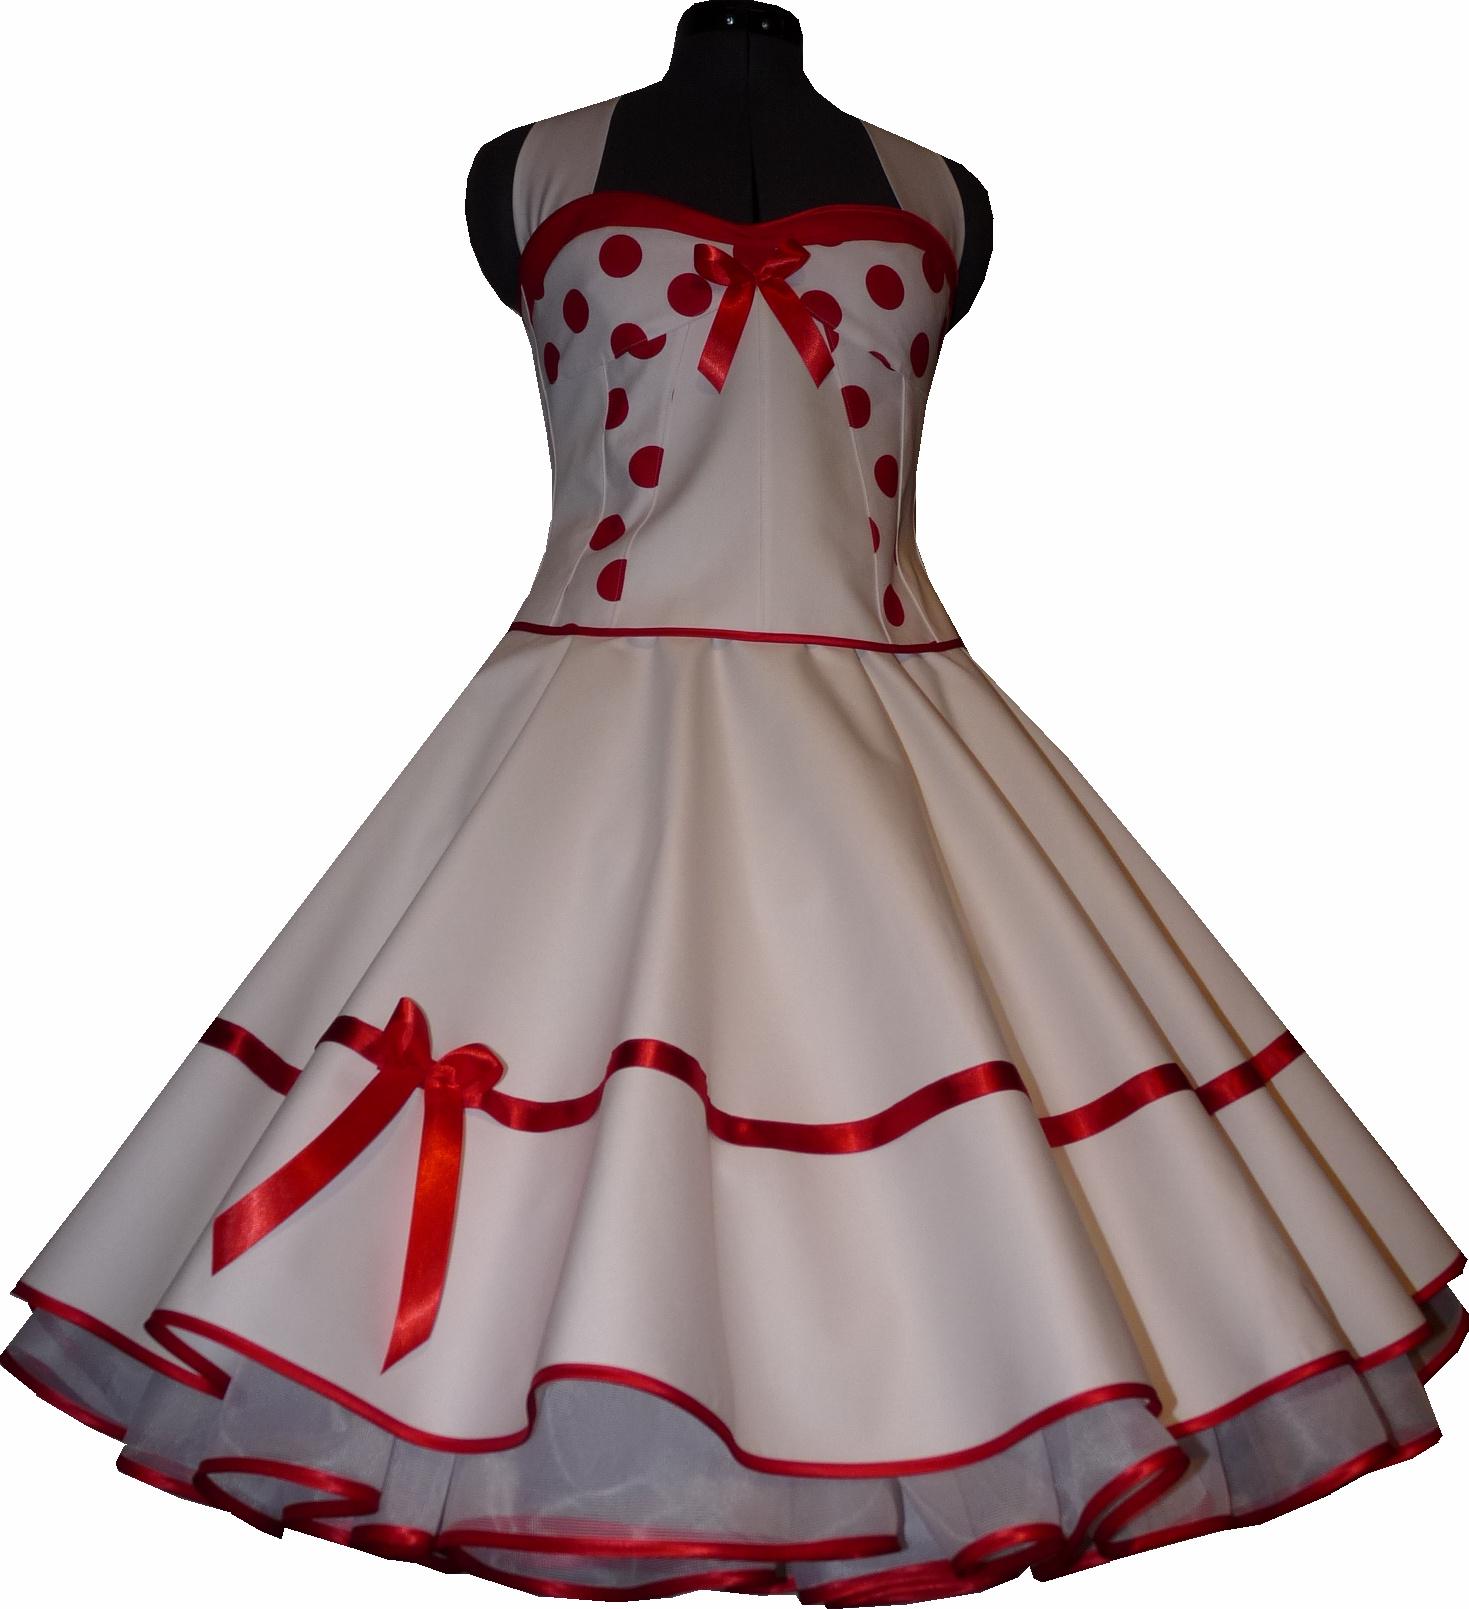 50er jahre brautkleid petticoat kleid wei korsage rote oder schwarze punkte. Black Bedroom Furniture Sets. Home Design Ideas